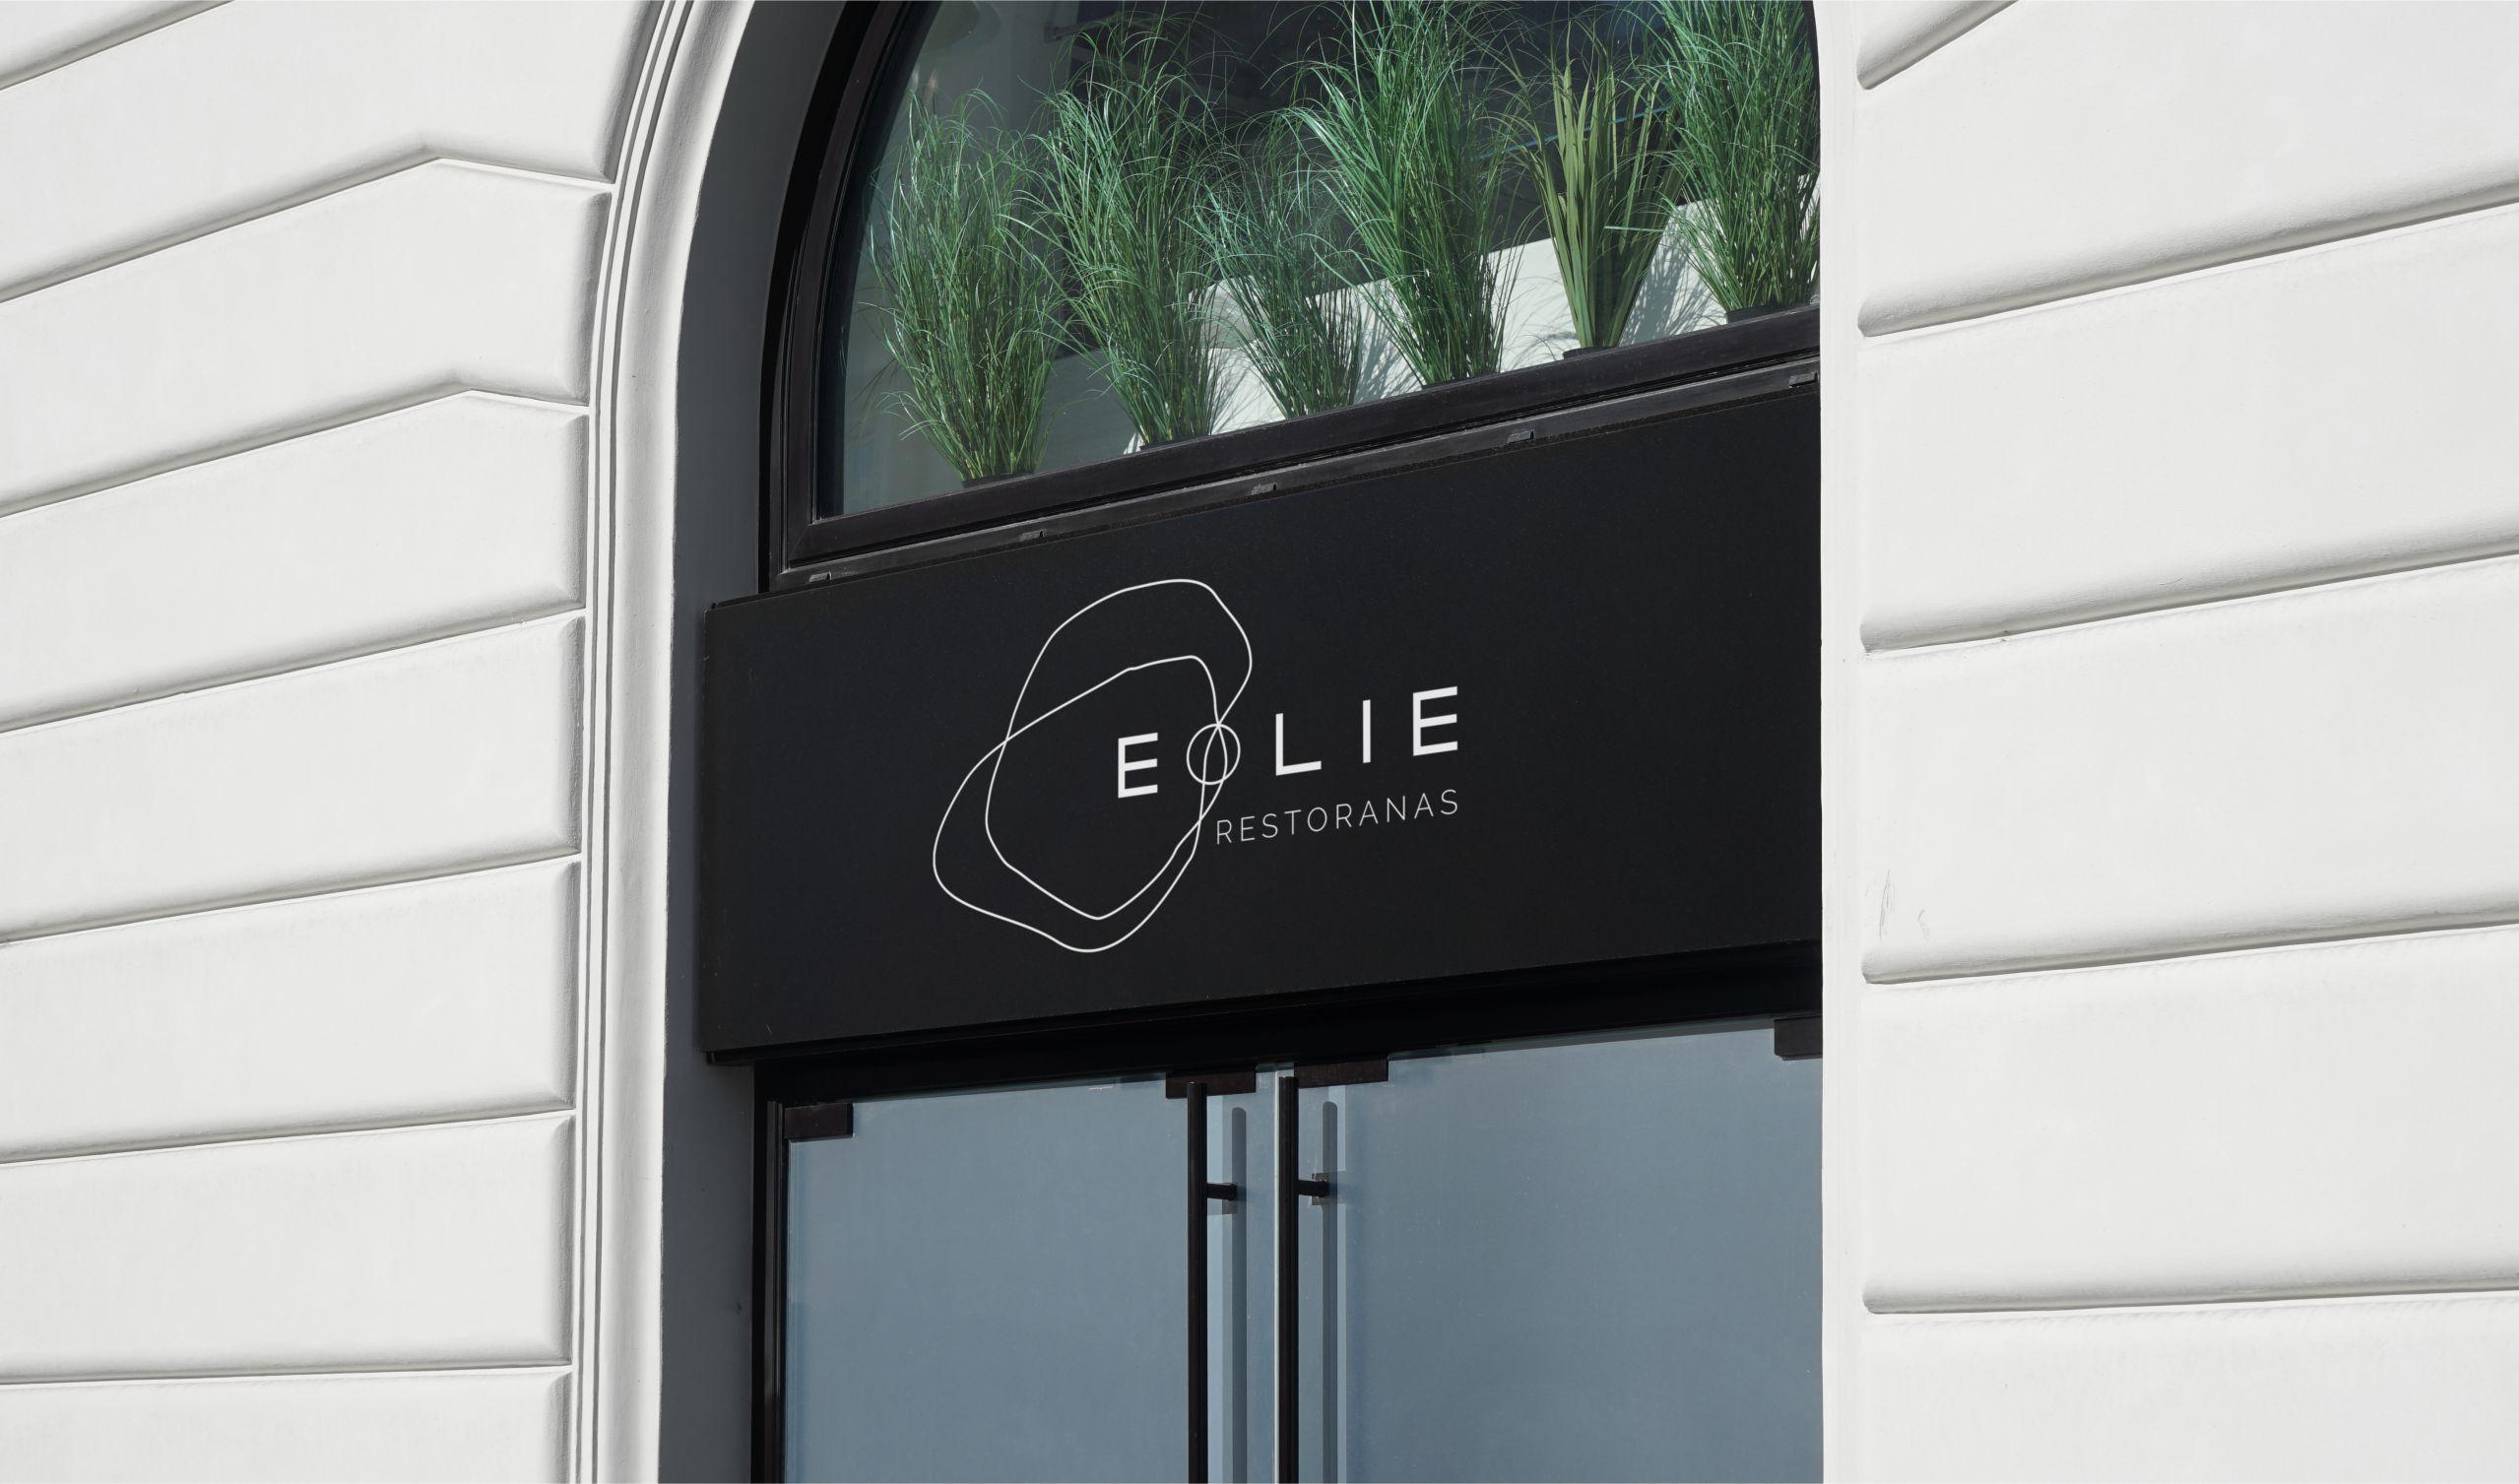 eolie restoranas